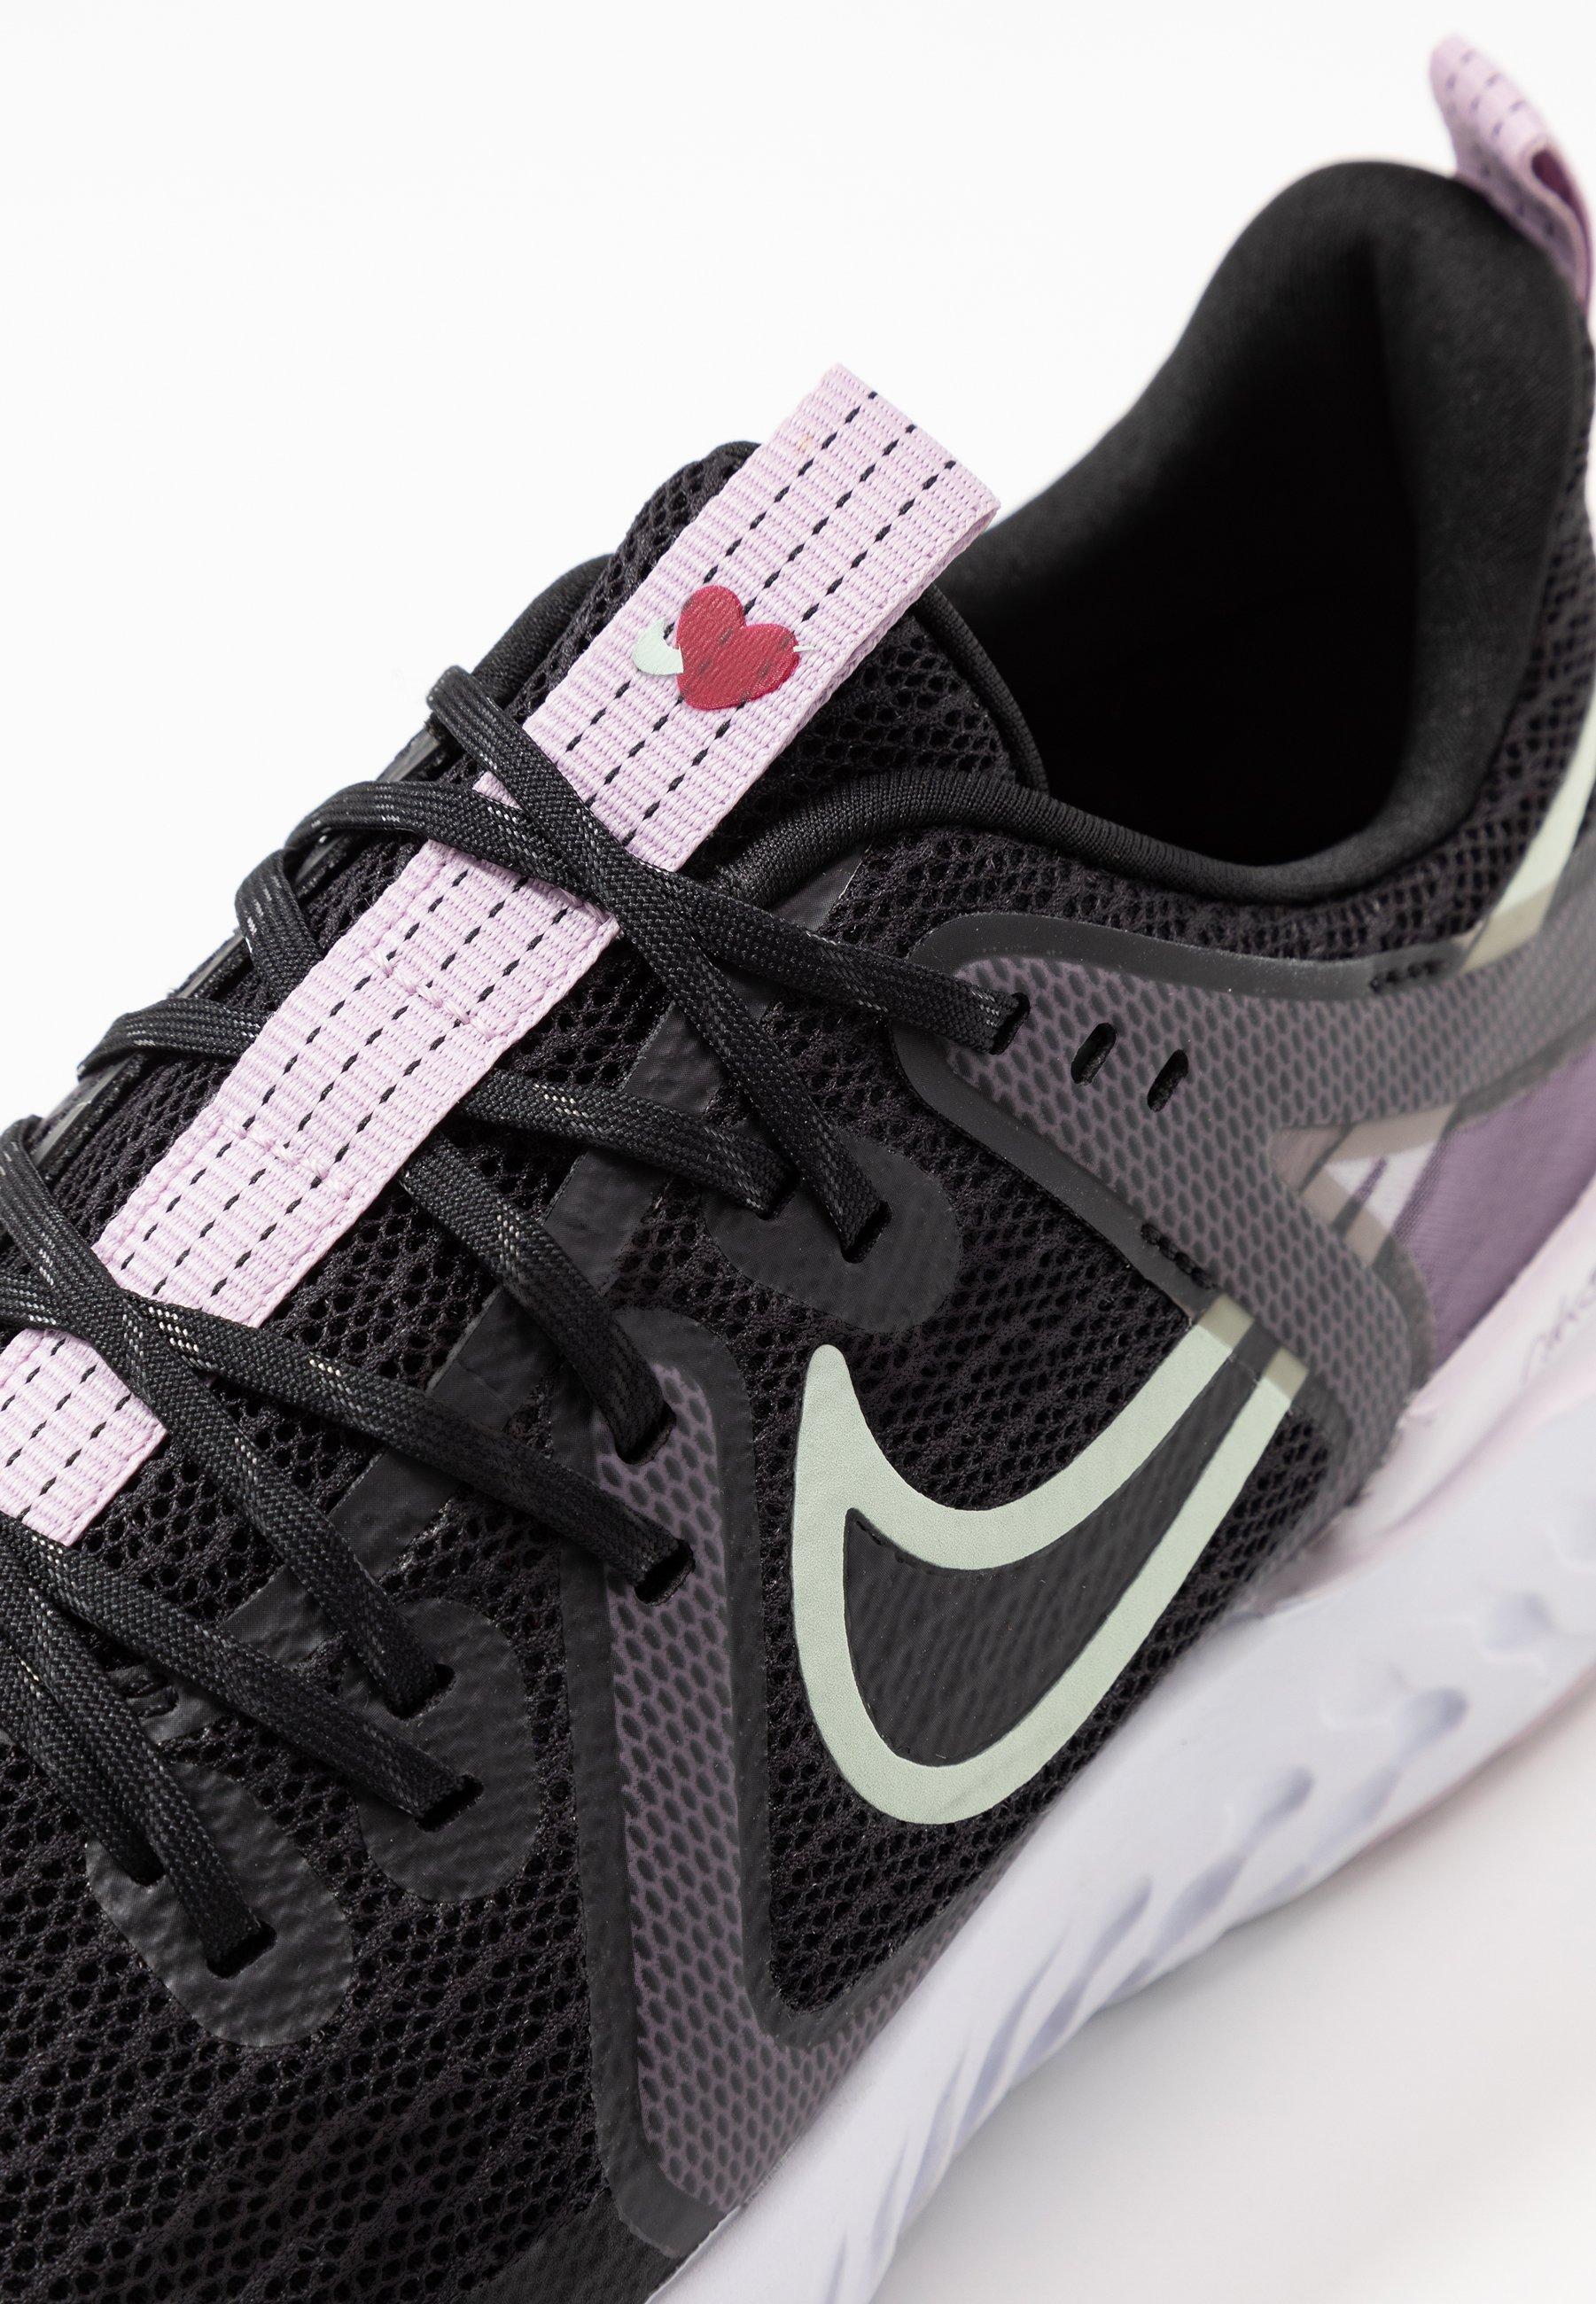 Acquisti online Scarpe da Donna Nike Performance LEGEND REACT 2 Scarpe running neutre black/pistachio frost/iced lilac/light violet/noble red